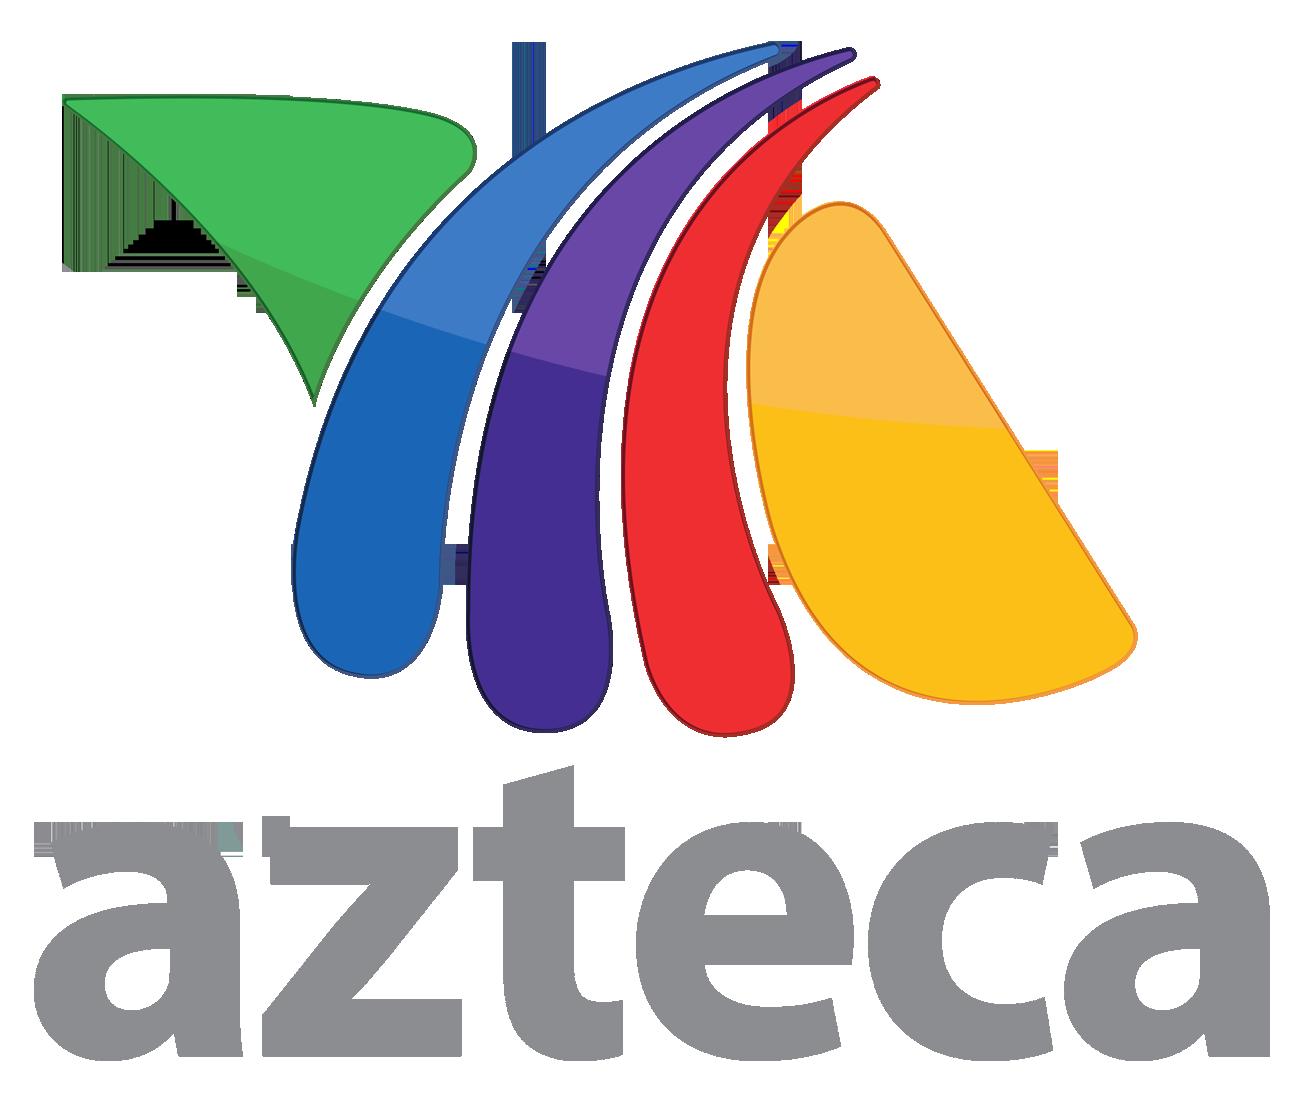 Azteca Guatemala.png